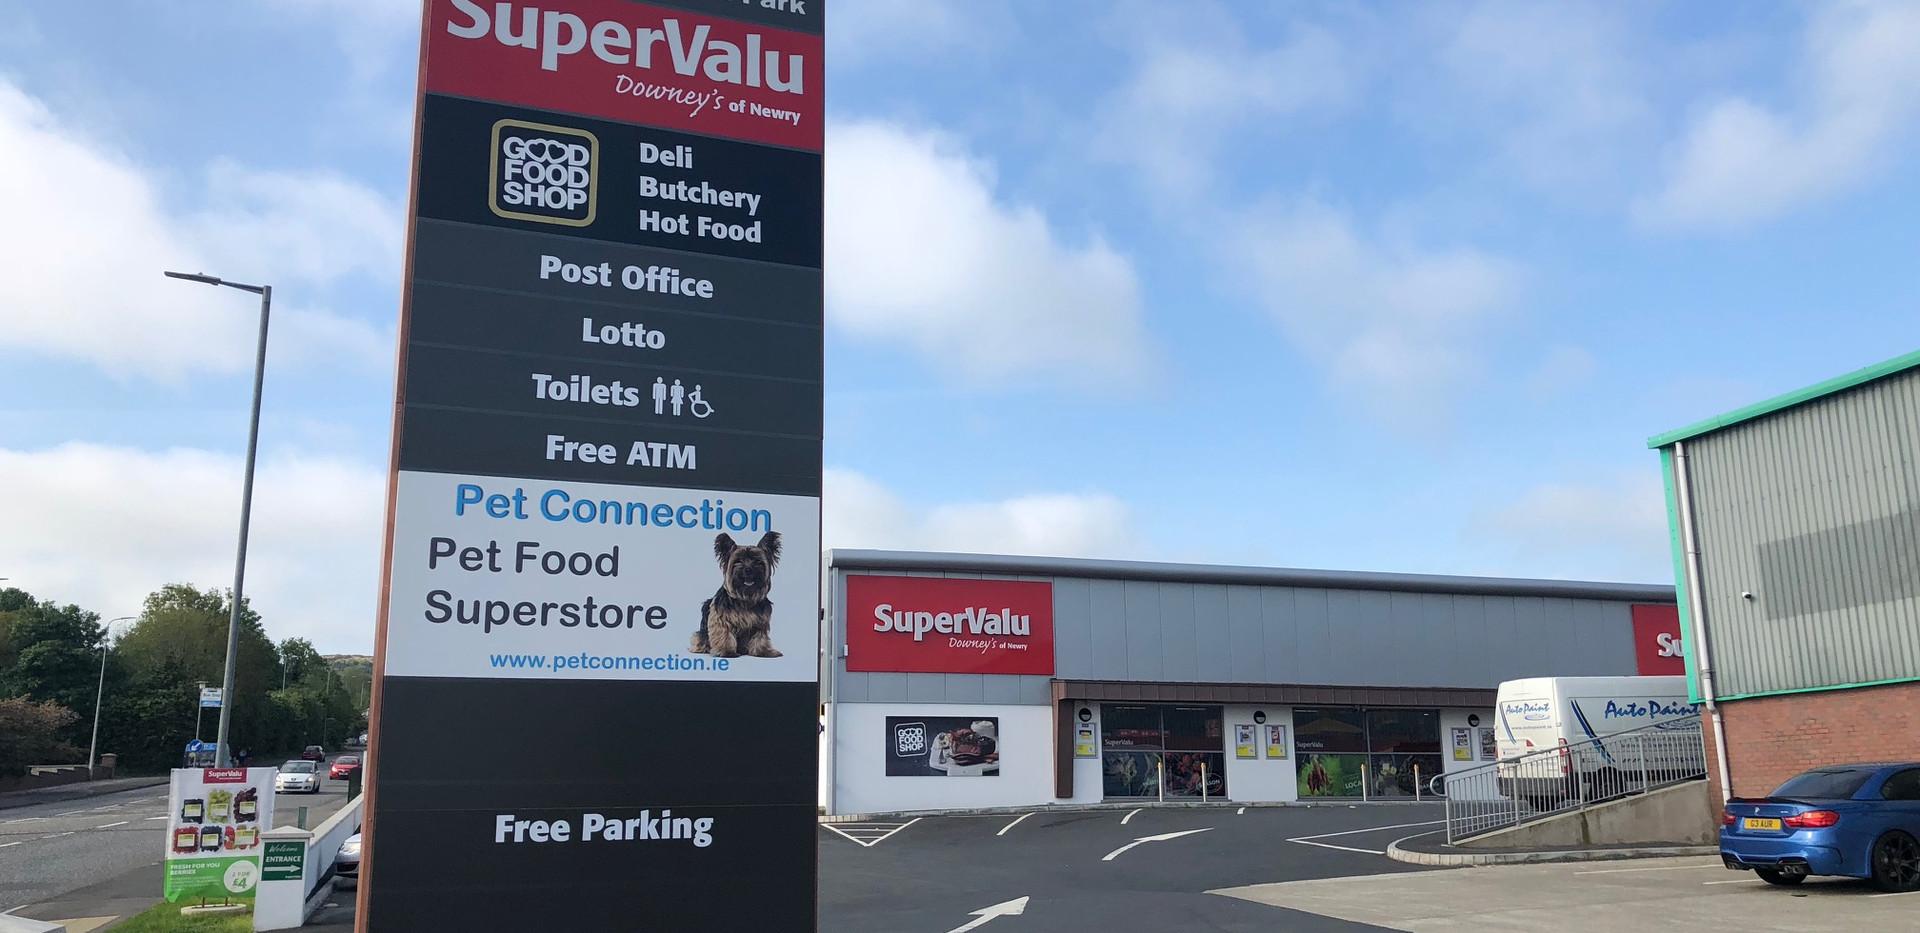 Supervalu Newry - Dublin Road 1.jpg